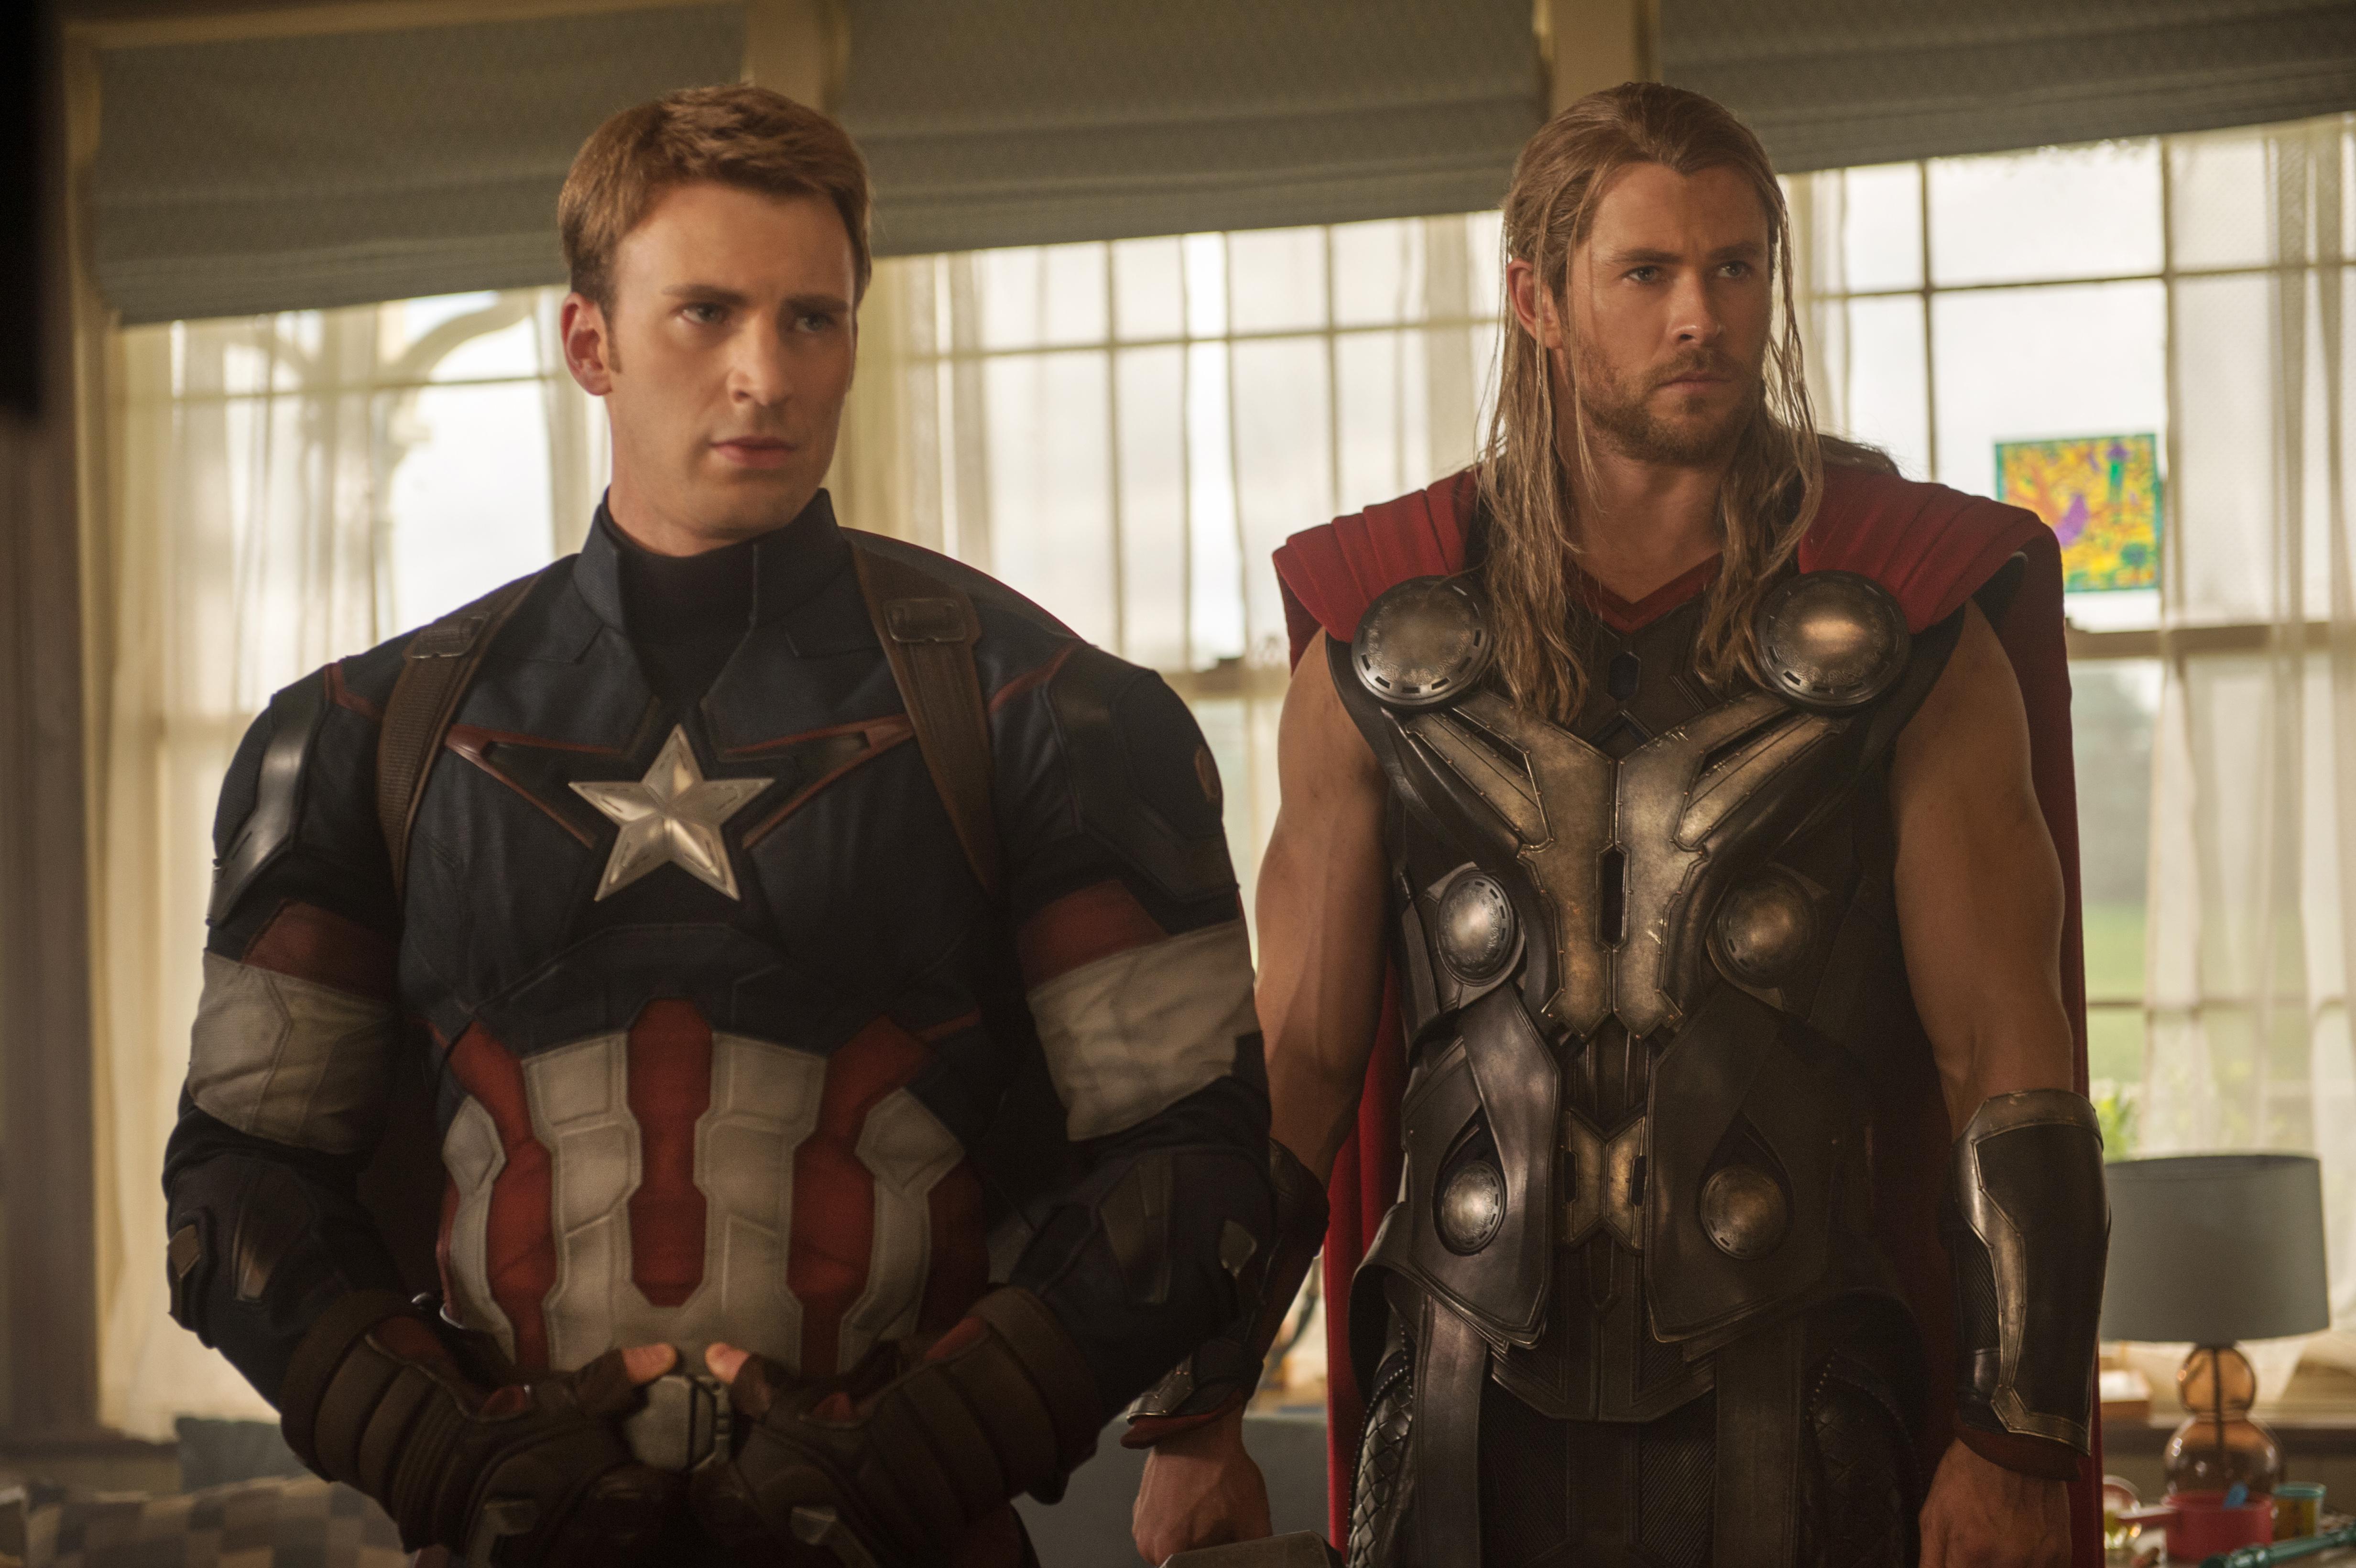 Avengers age of ultron chris evans chris hemsworth1